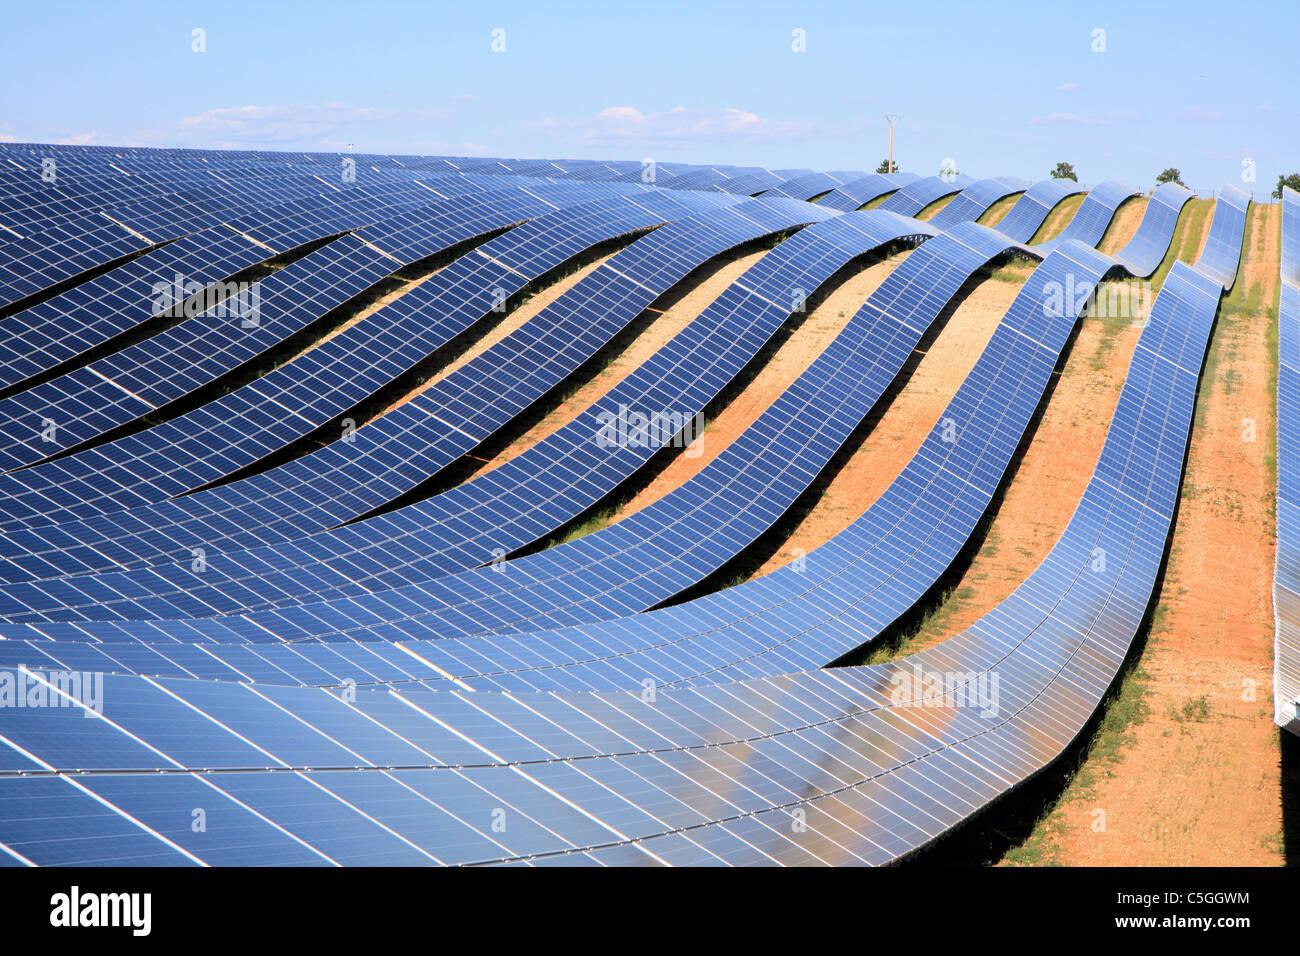 Gigantic solar farm in provence les m es france stock for Solar ranch